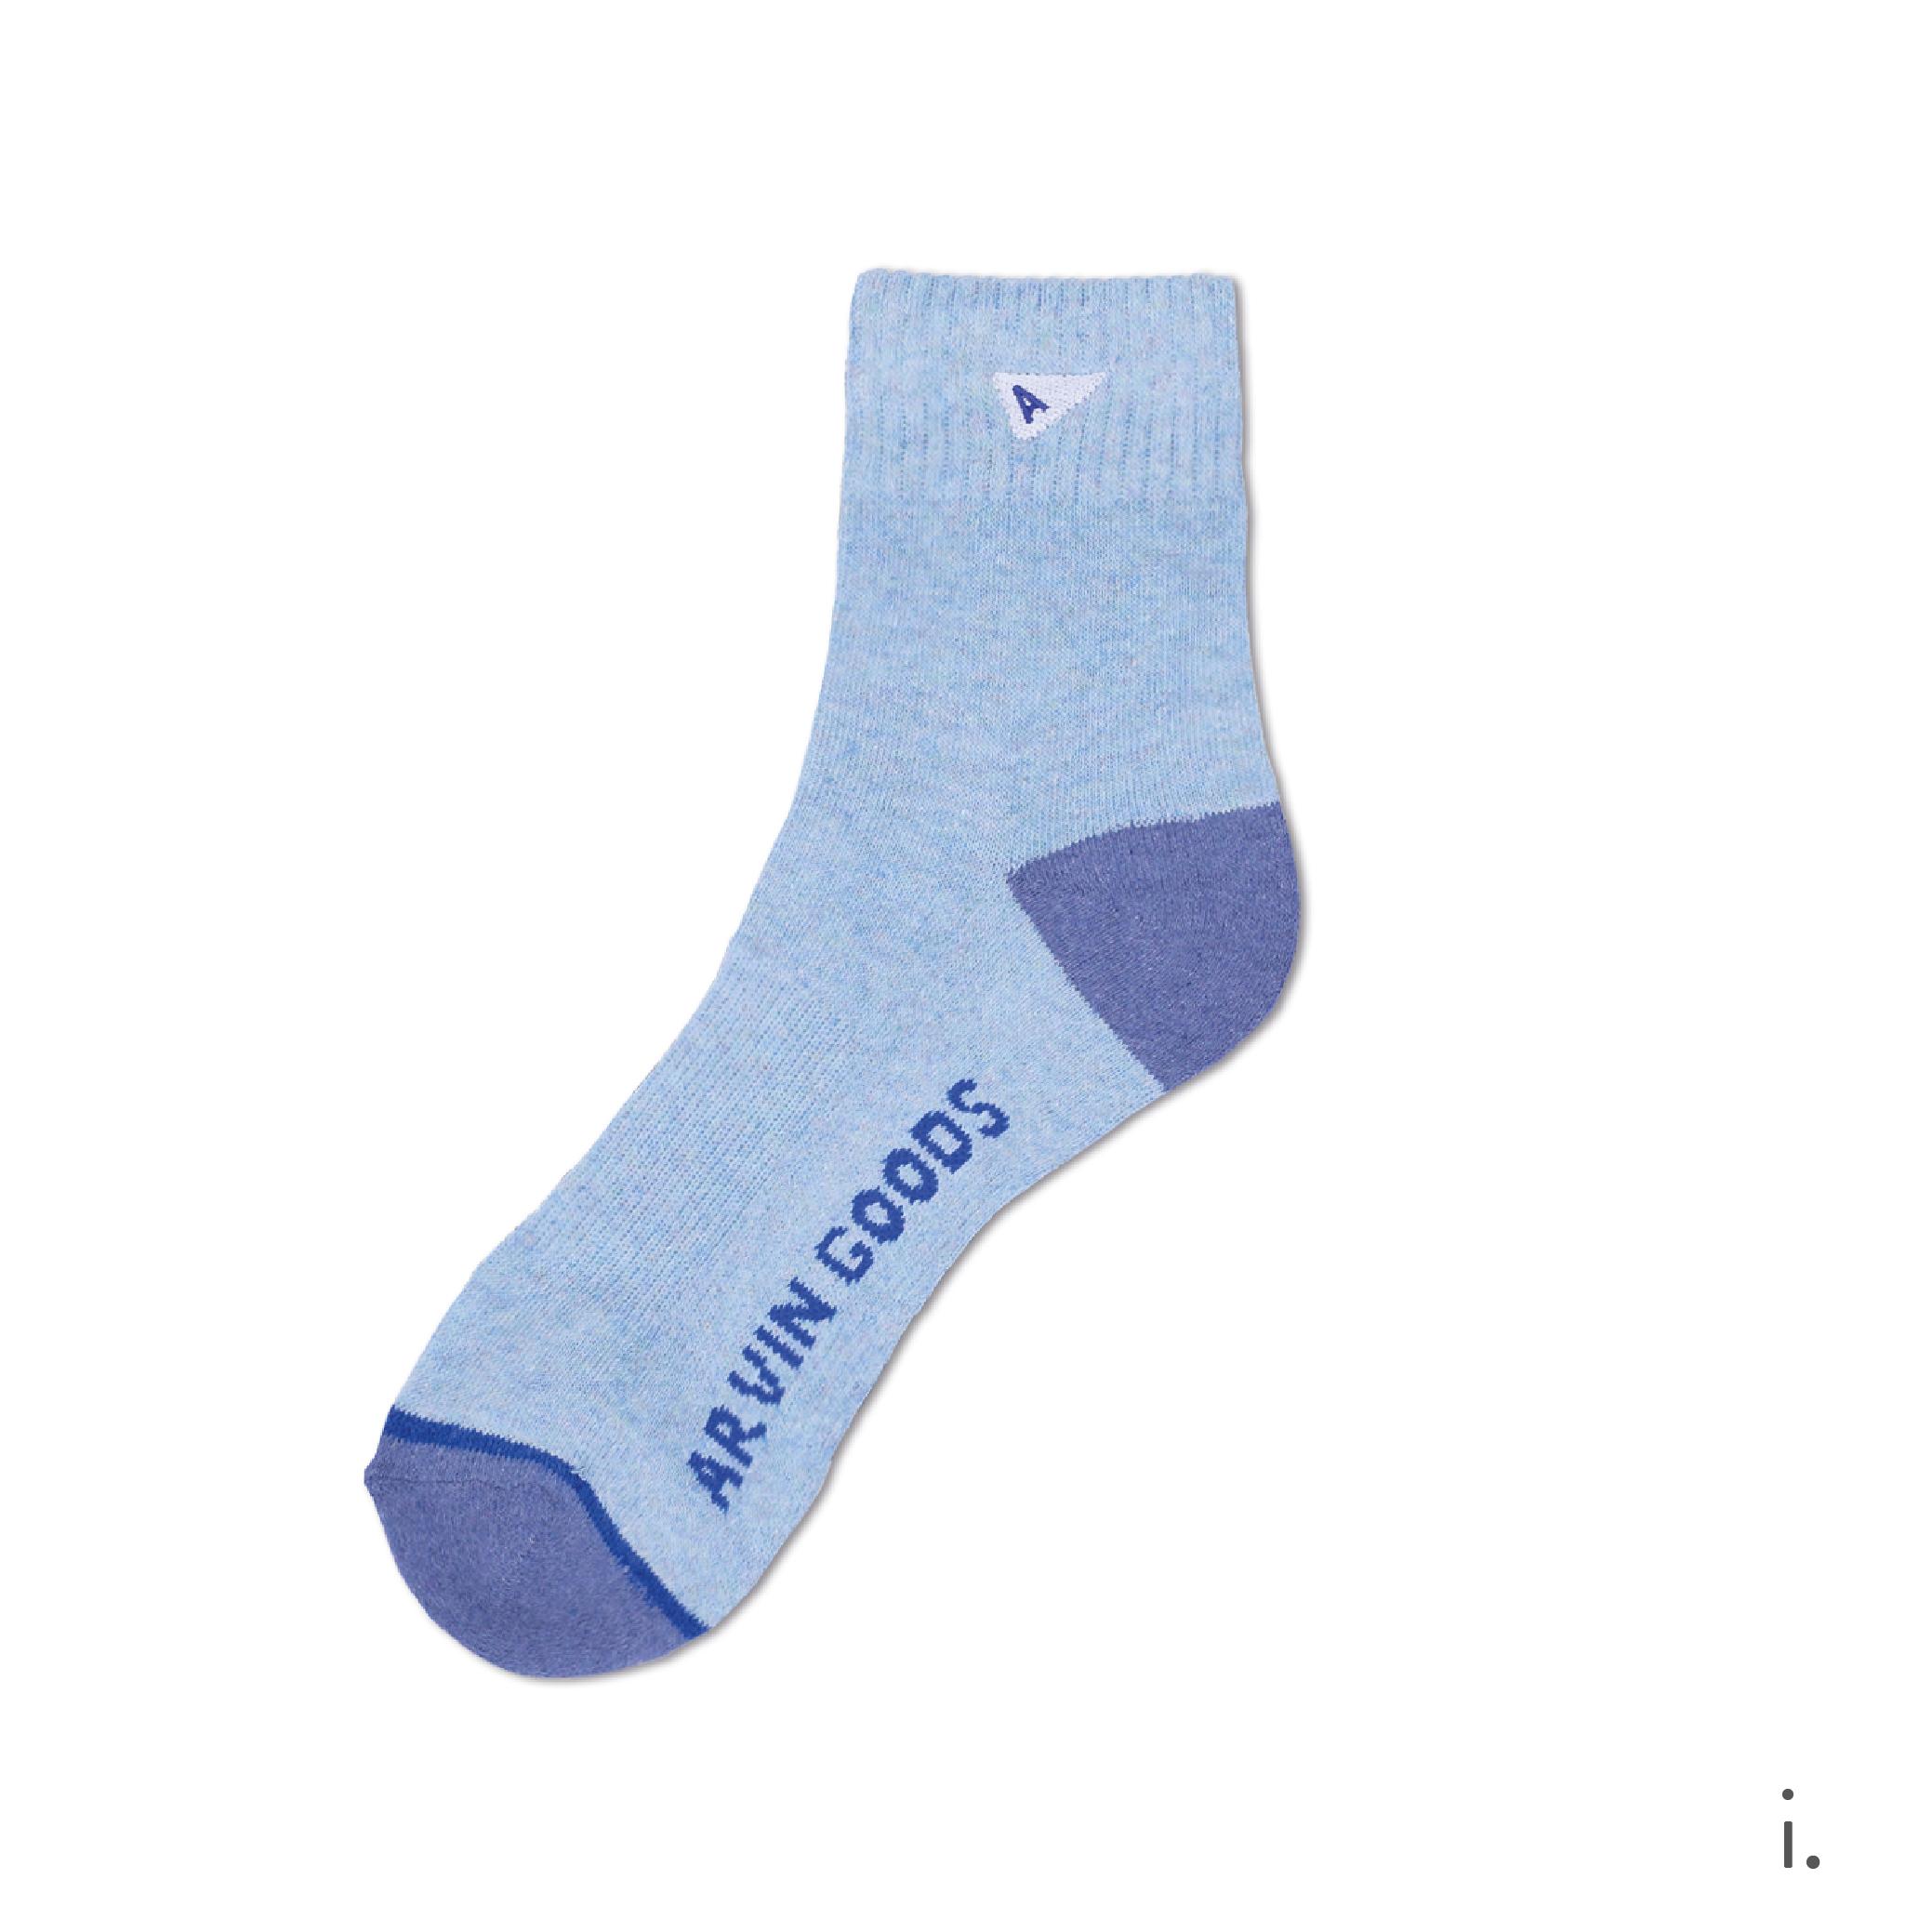 i. Light Blue & Blue Crew Sock-01.png